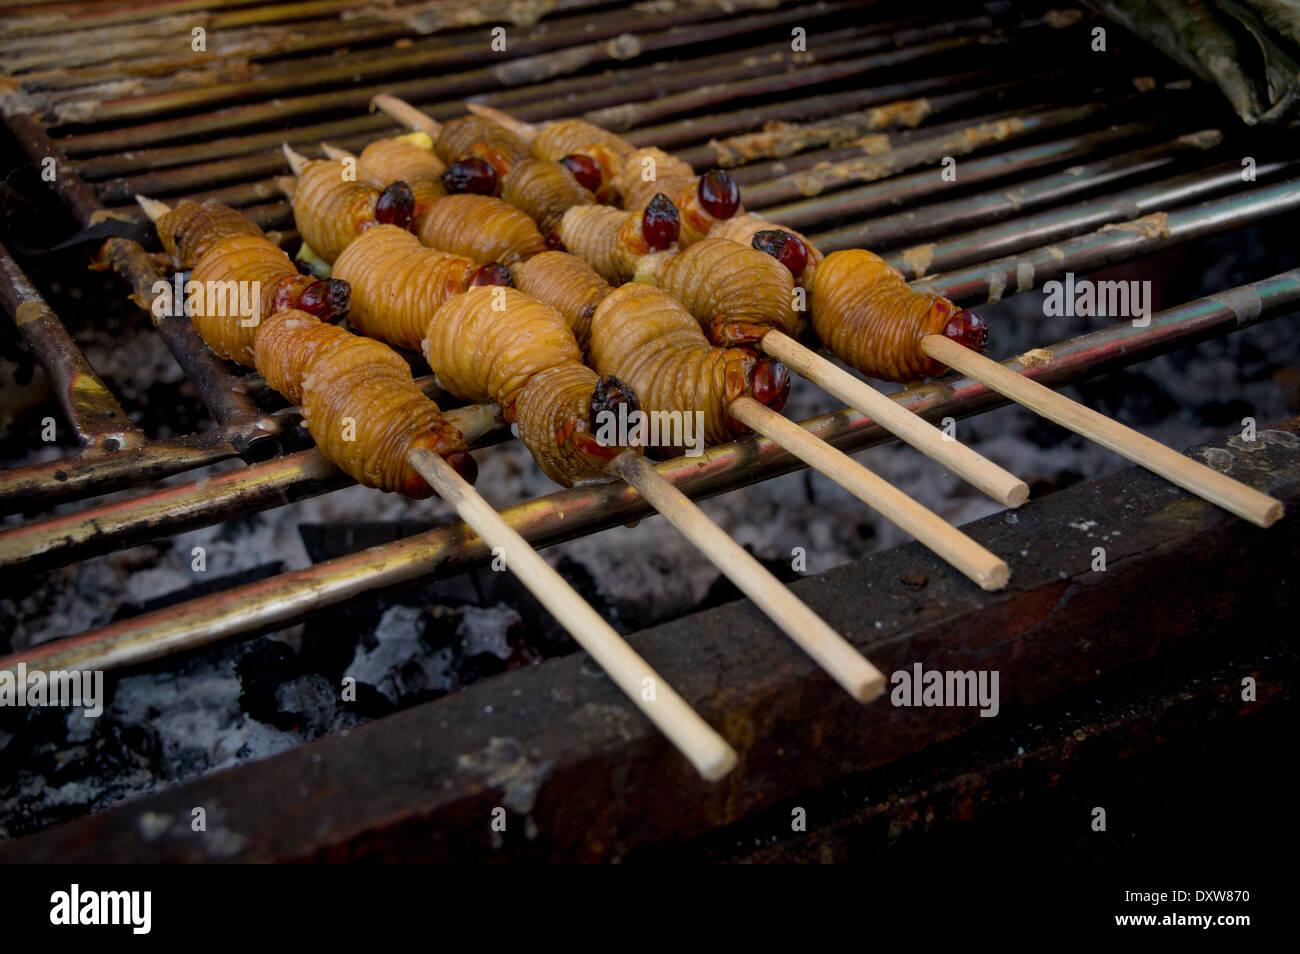 Edible palm weevil larvae (Rhynchophorus phoenicis) from the Amazon - Stock Image